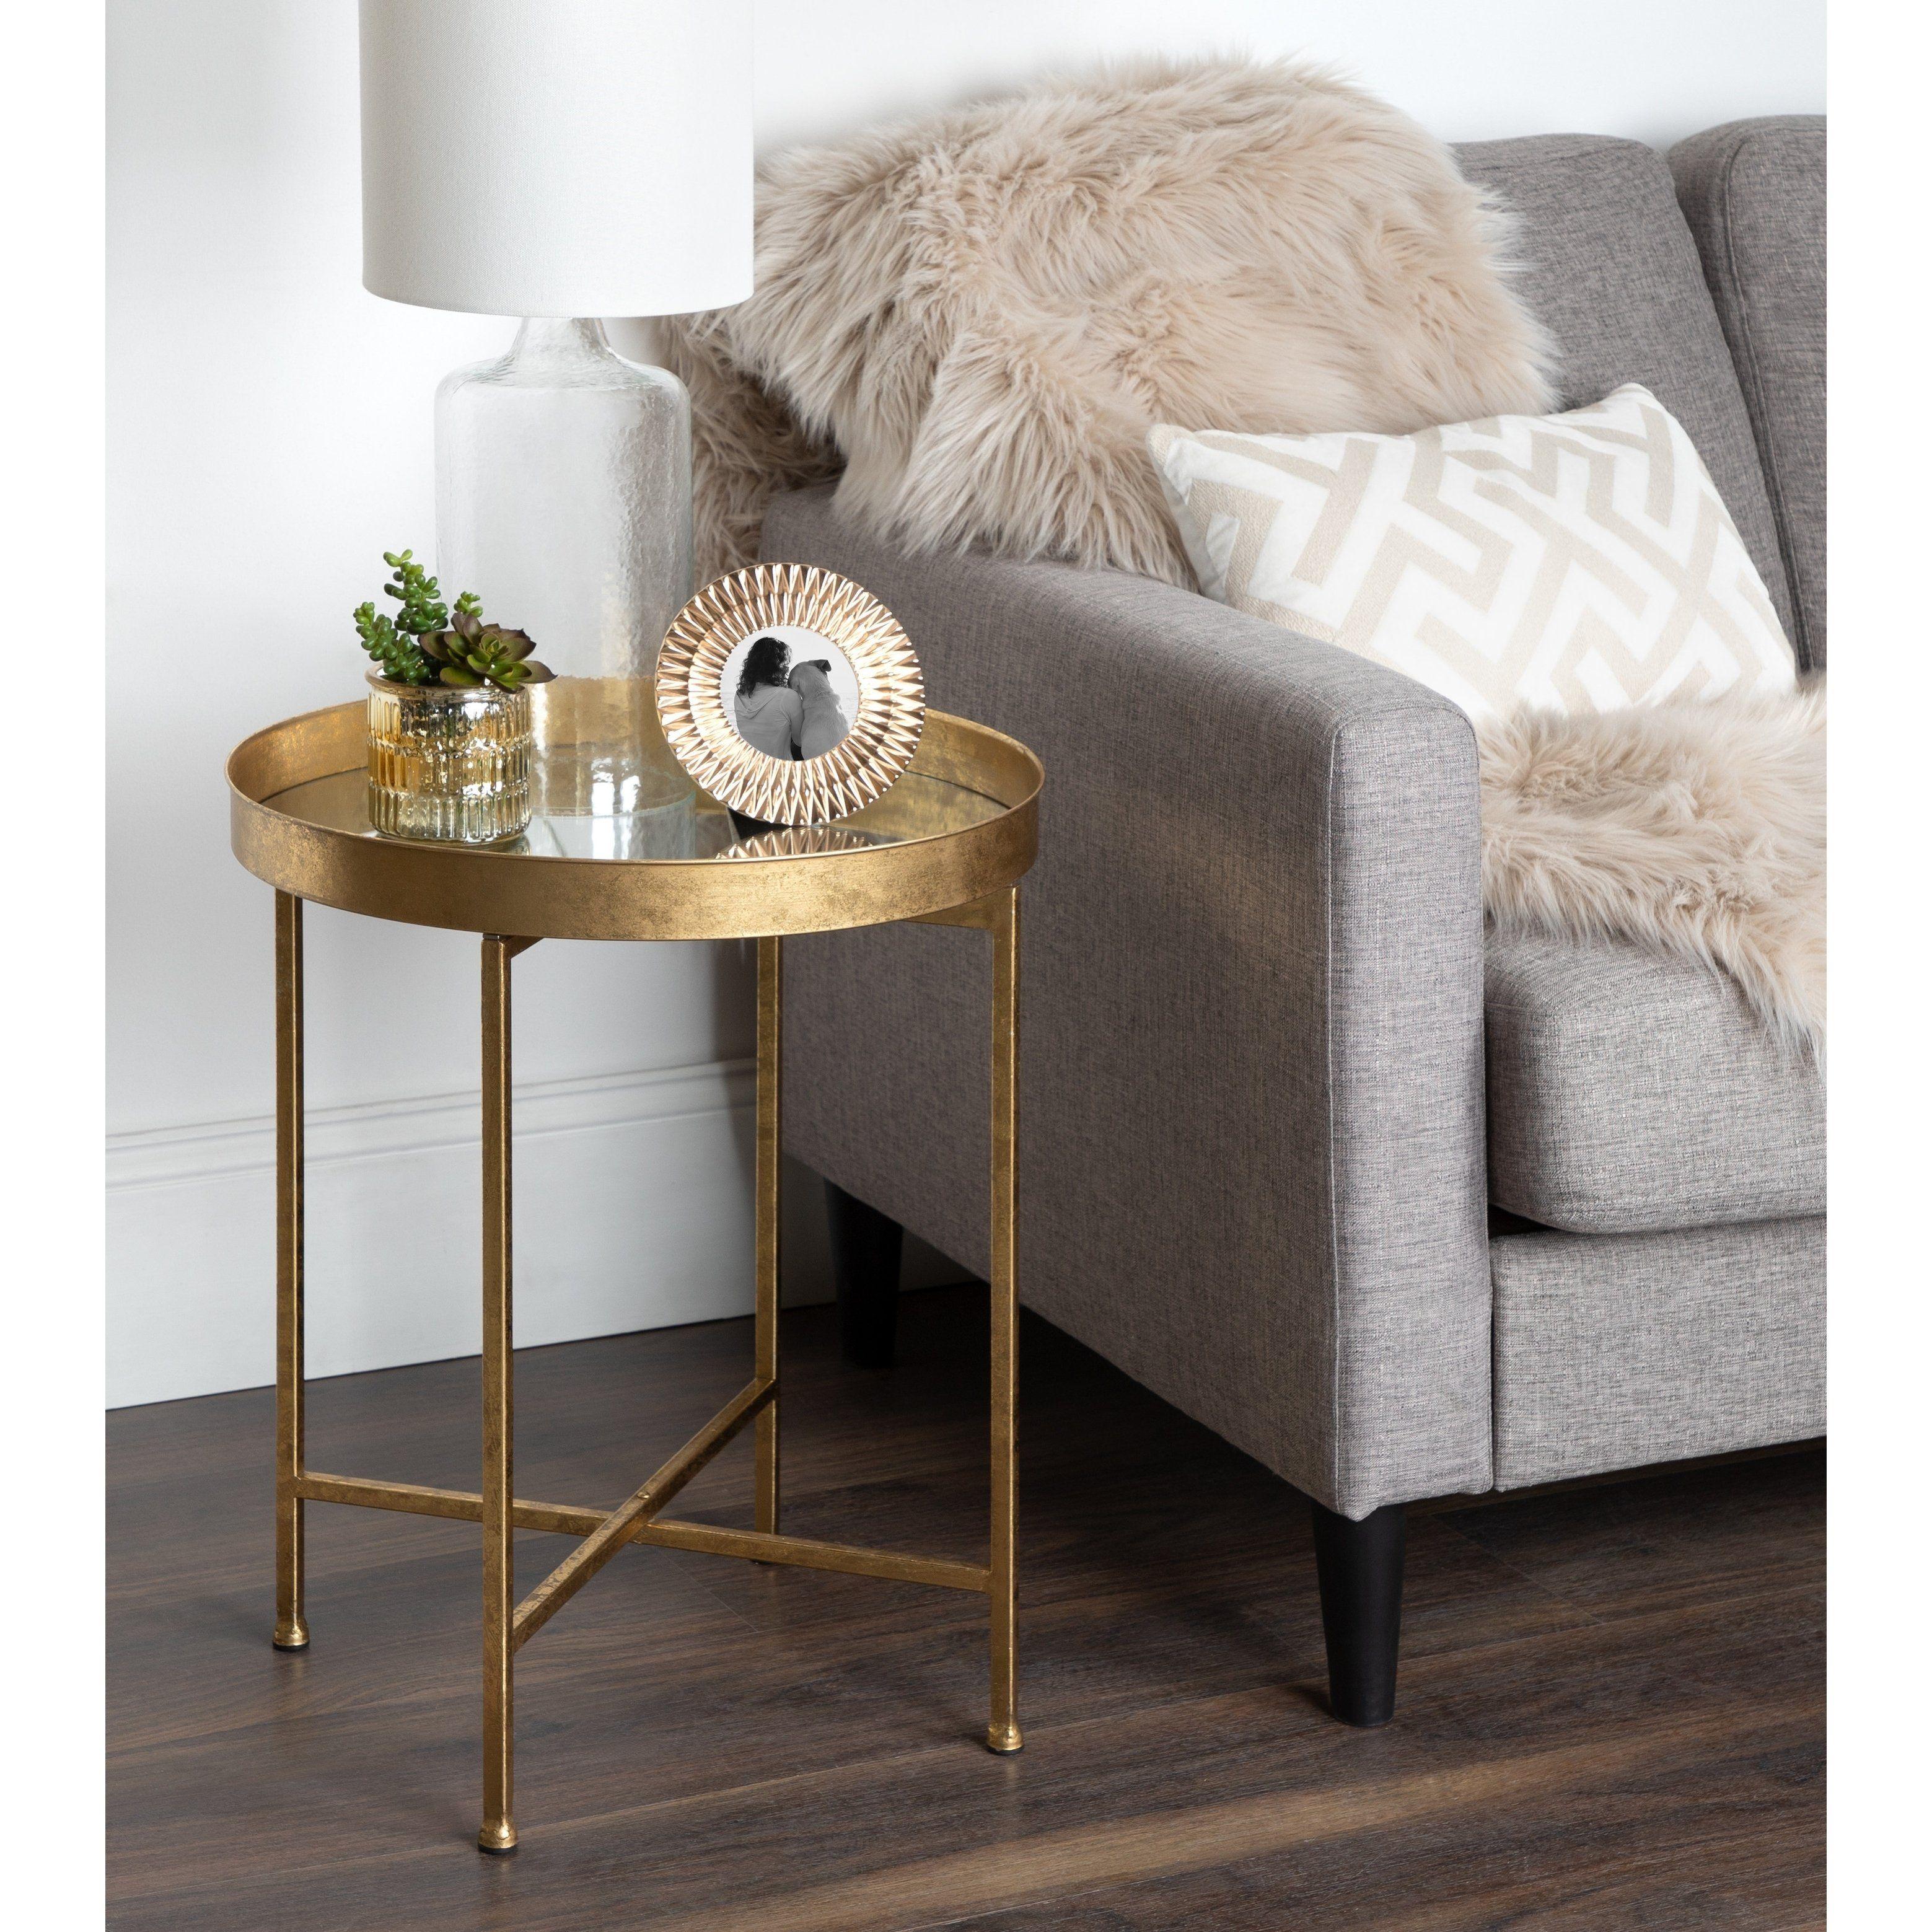 Kate And Laurel Celia Metal Round Side Table Gold Side Table Decor Round Metal Side Table Metal Side Table